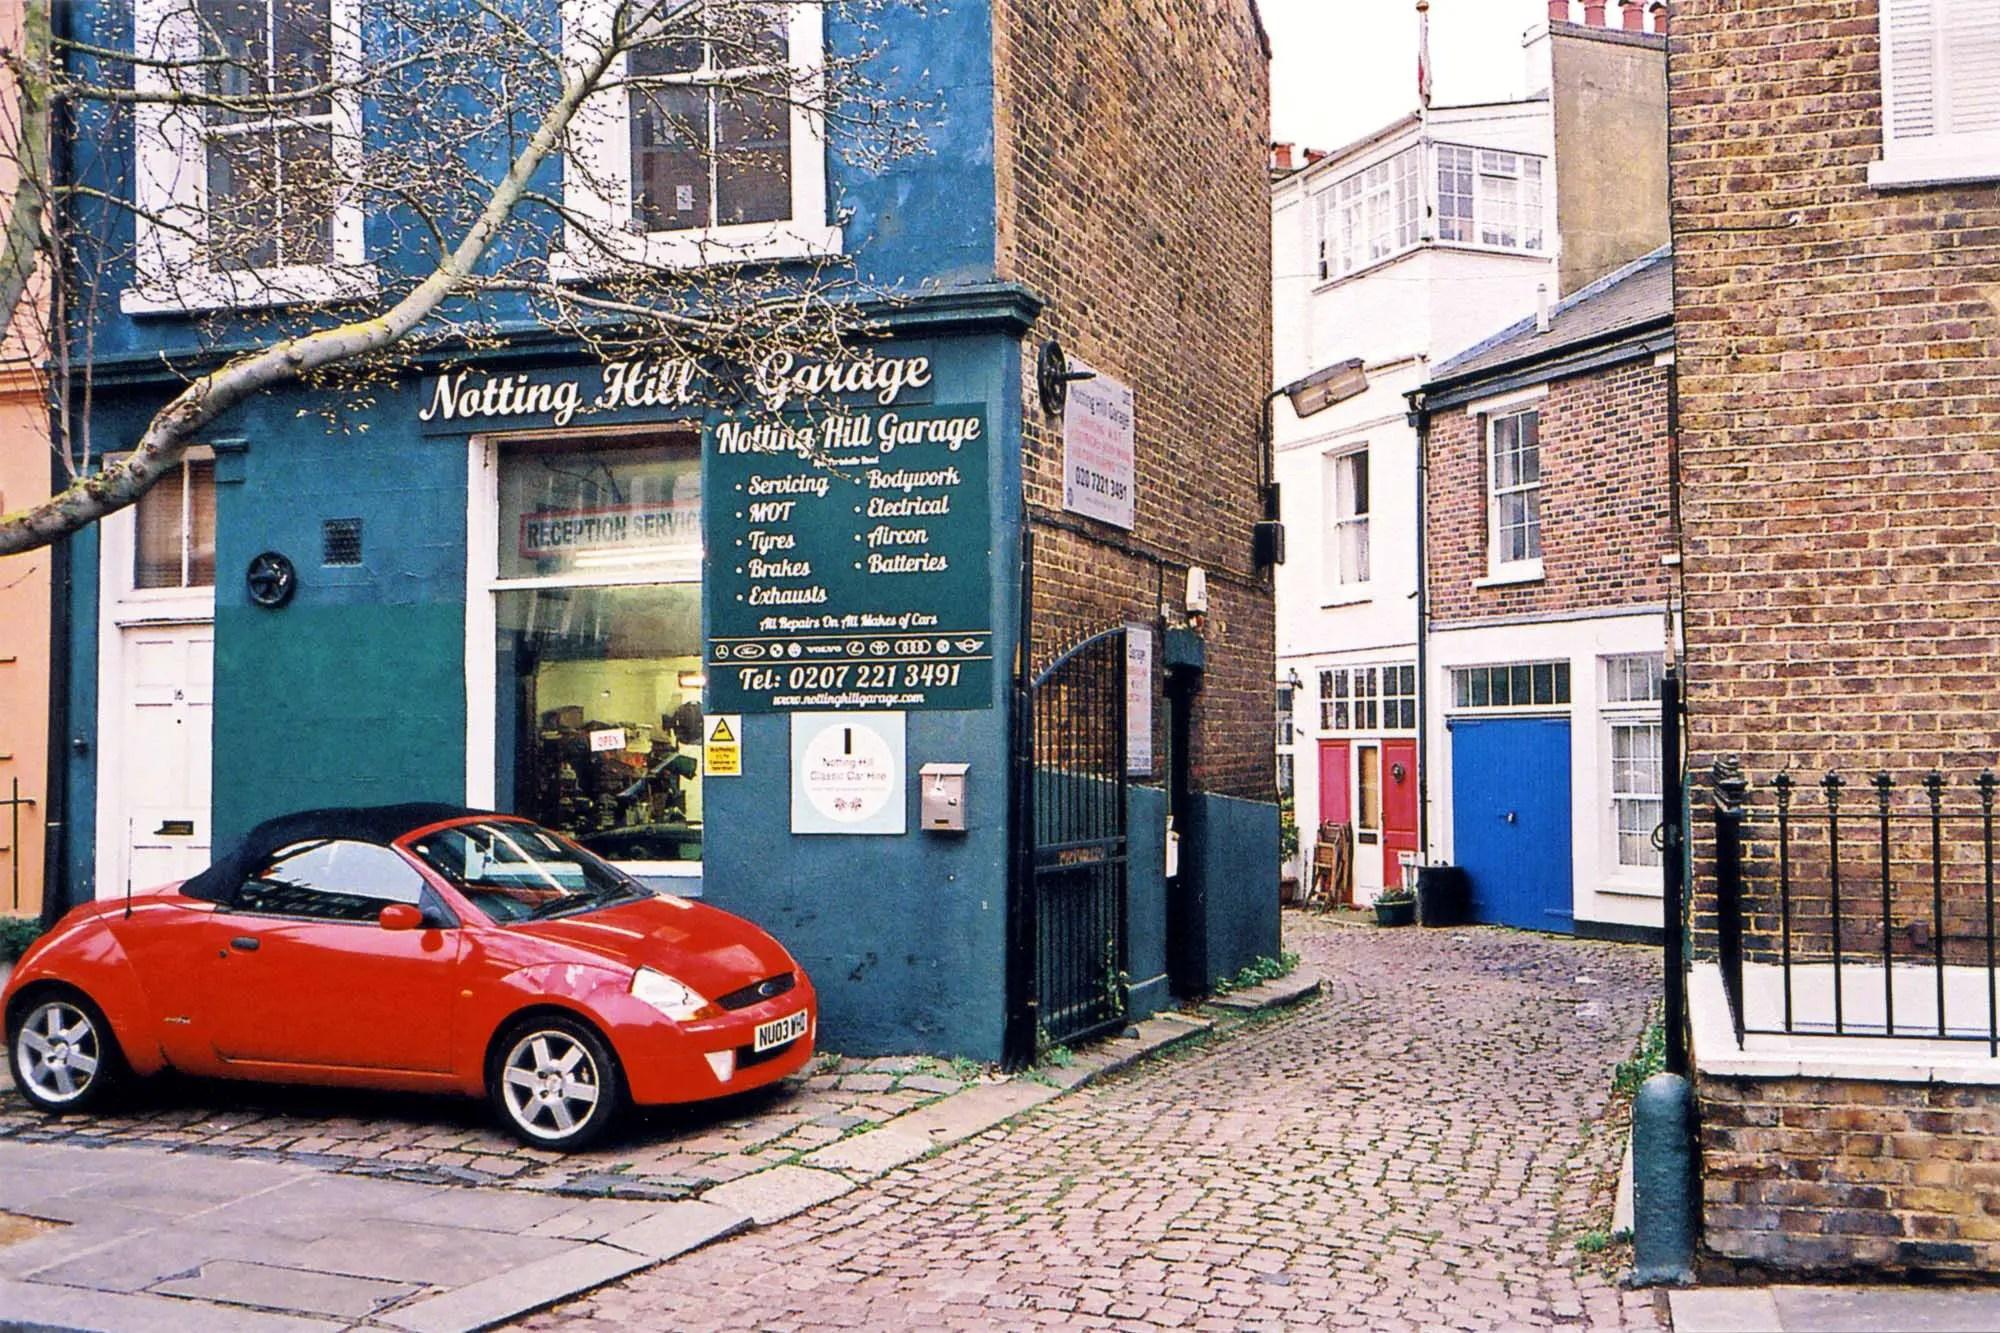 Nikon 35Ti - Notting Hill Street Scene